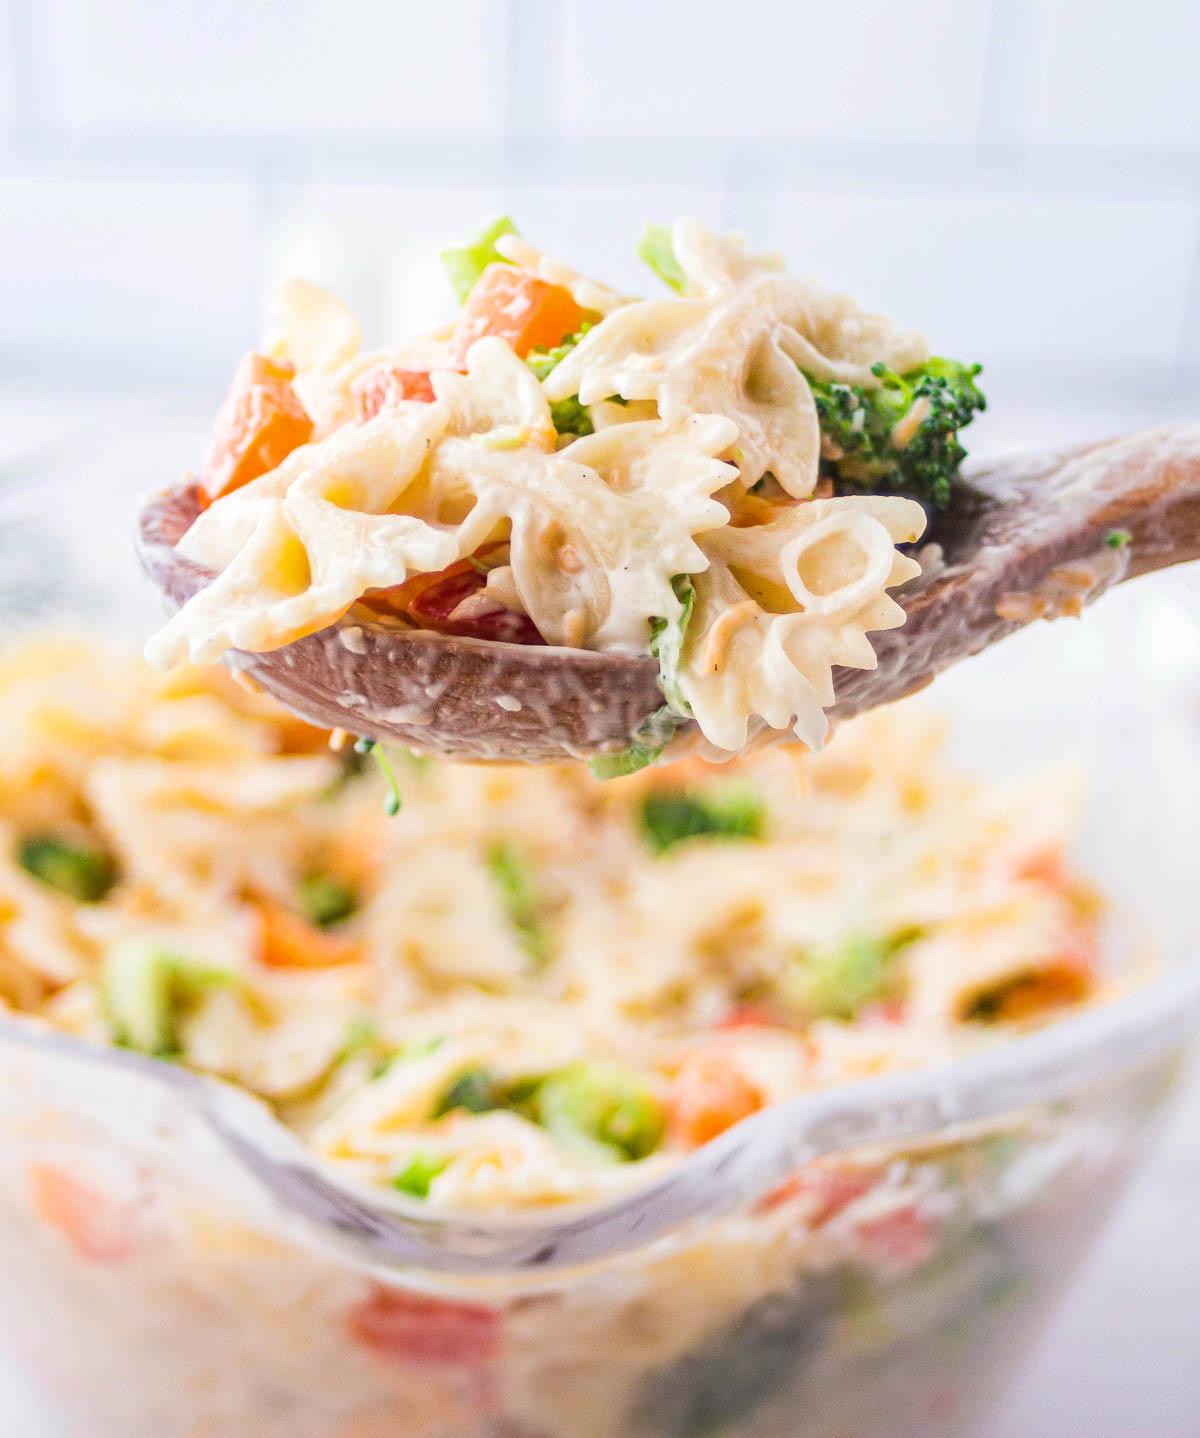 Broccoli ranch pasta salad on a serving spoon.